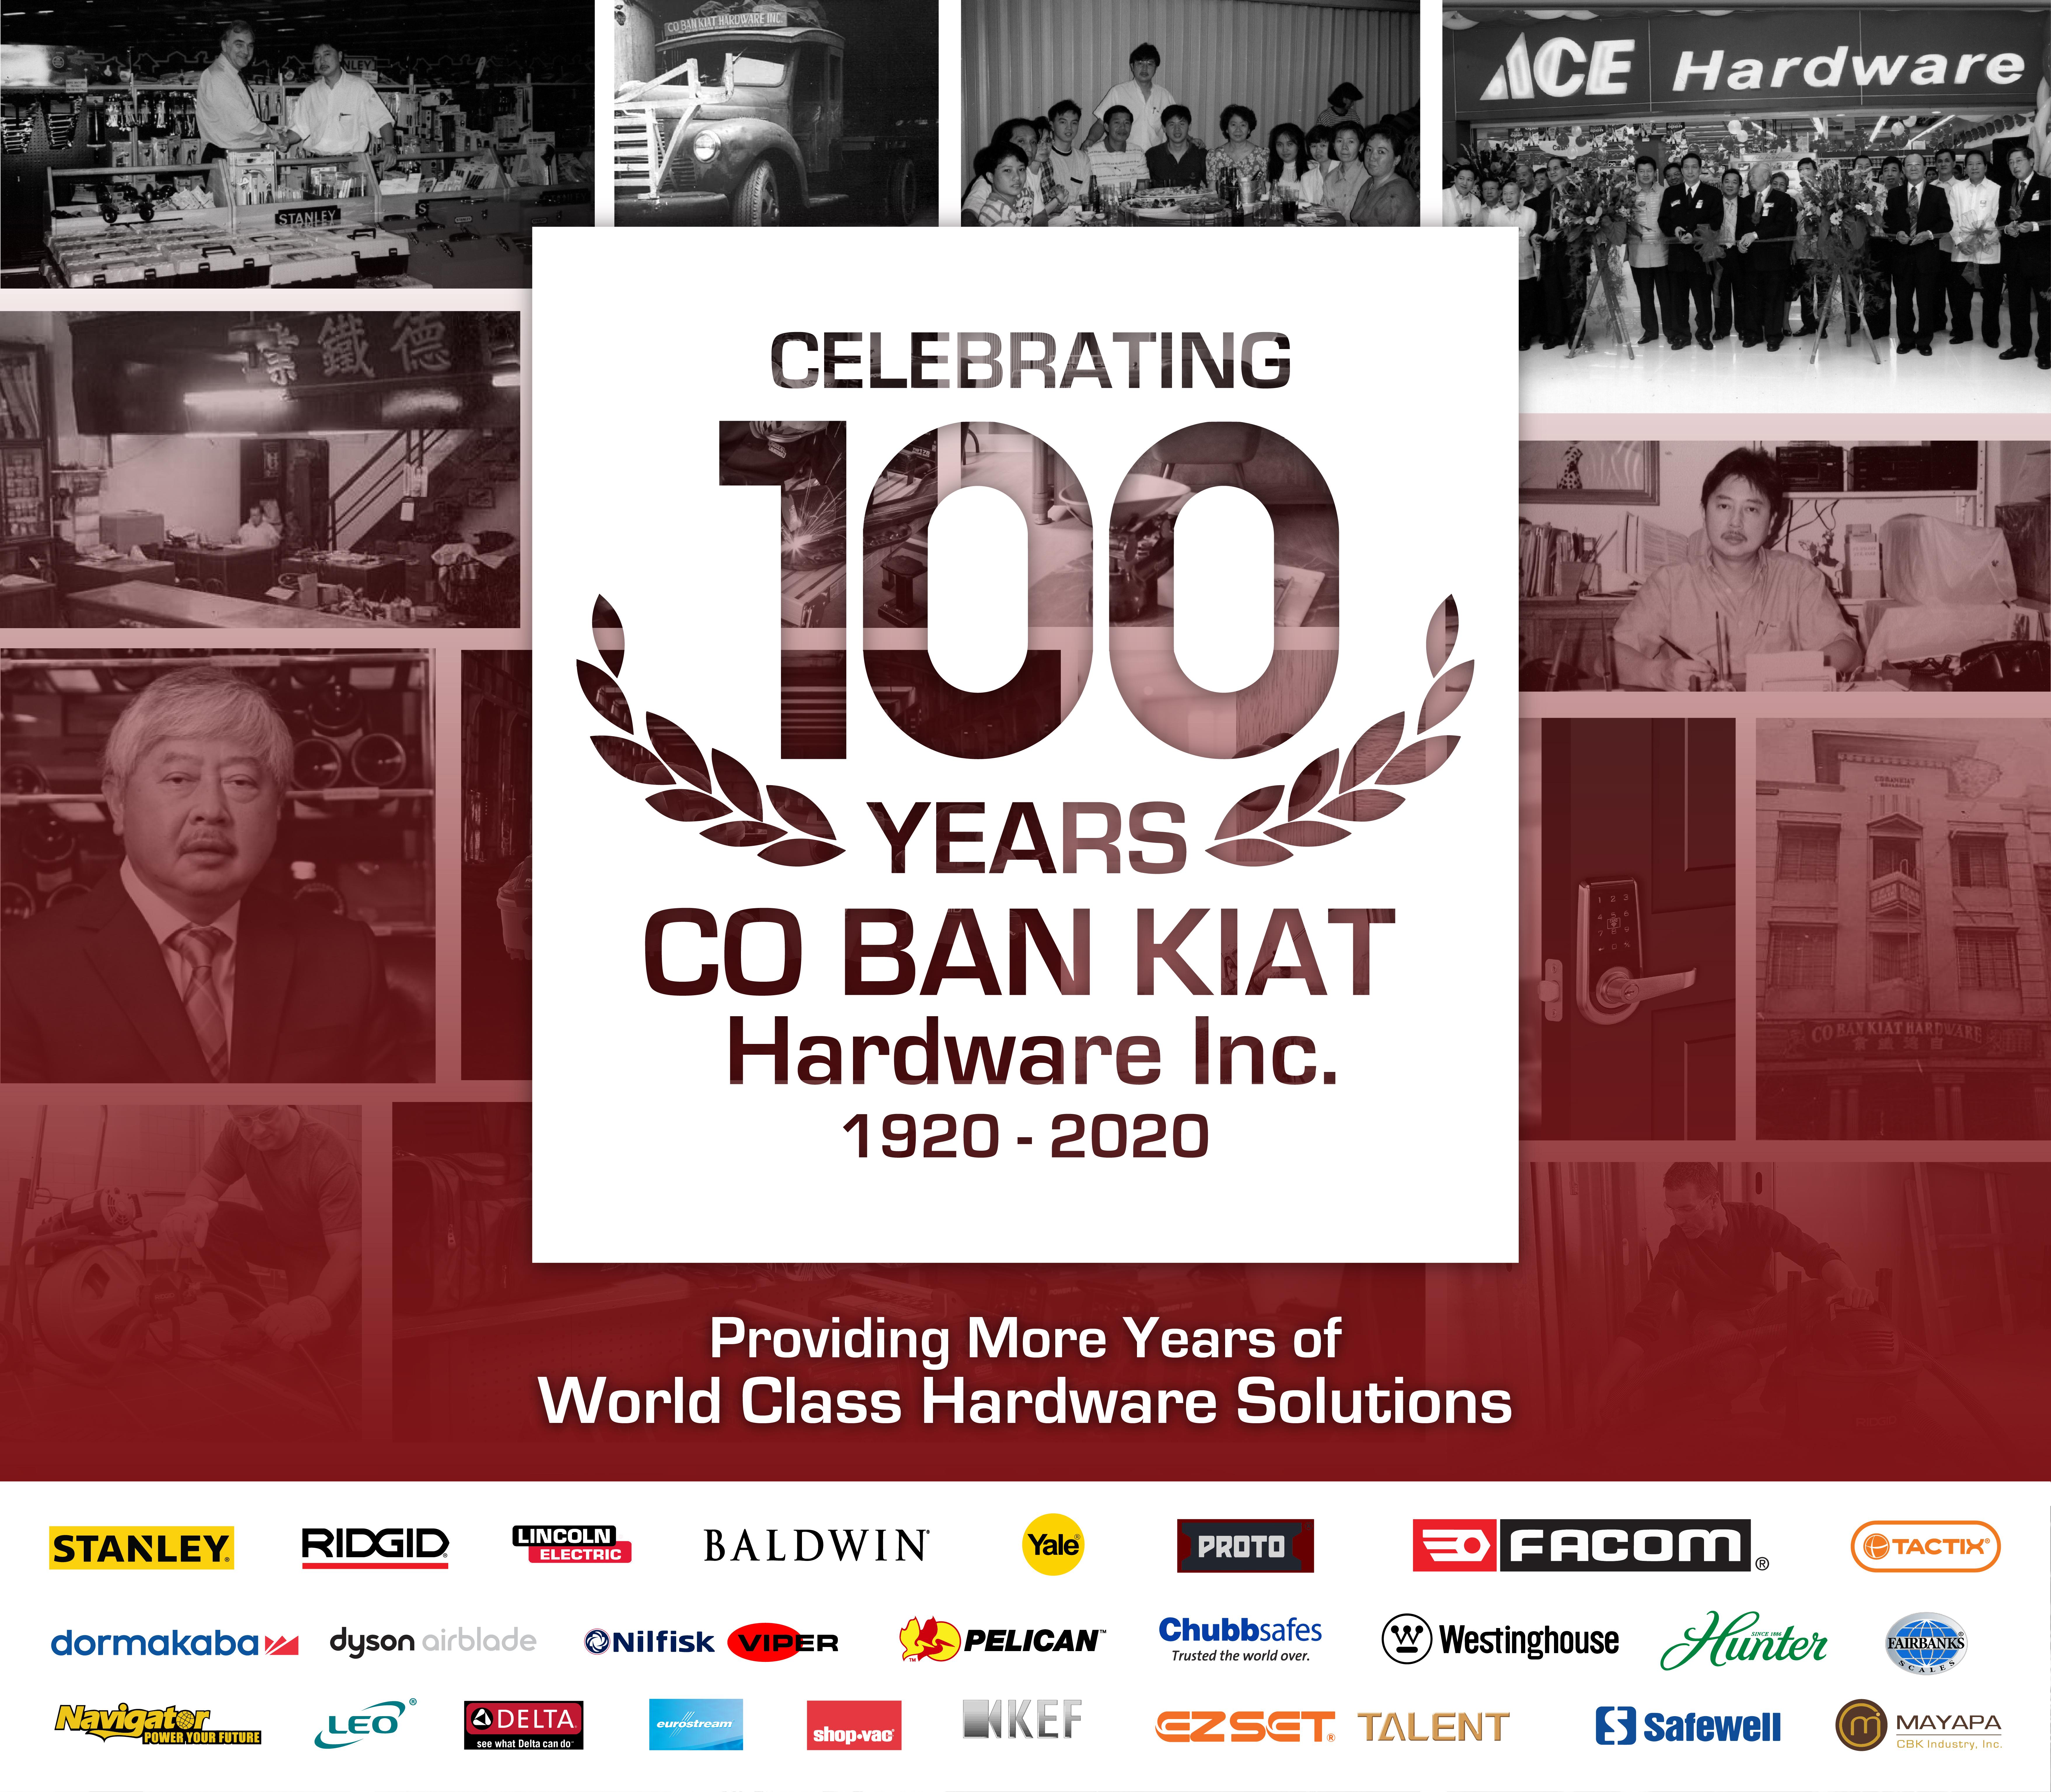 CBK Hardware Sale 100 years